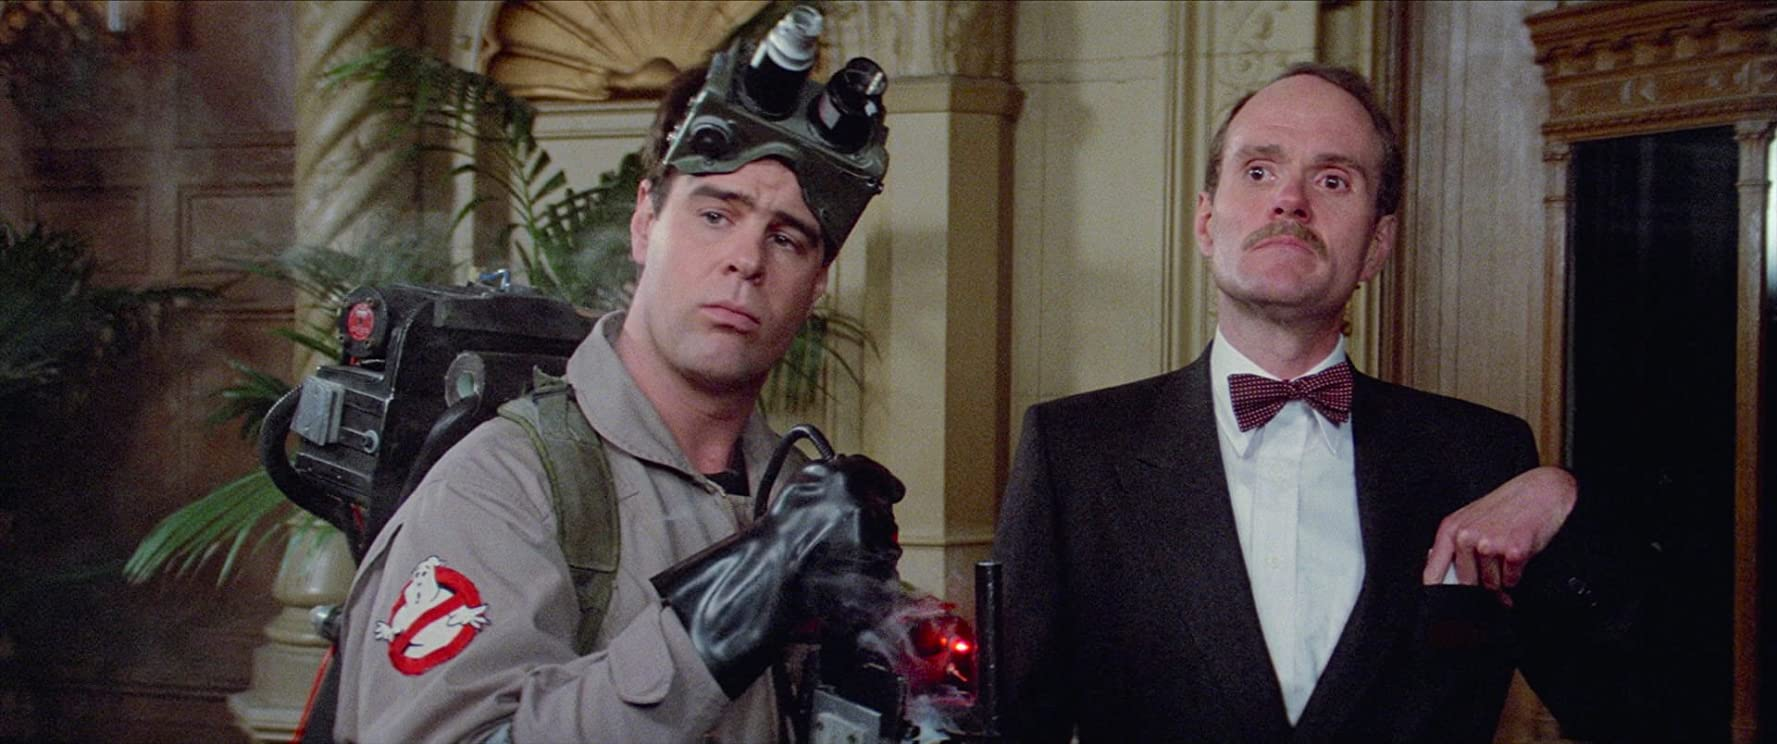 Dan Aykroyd and Michael Ensign in Ghostbusters (1984)